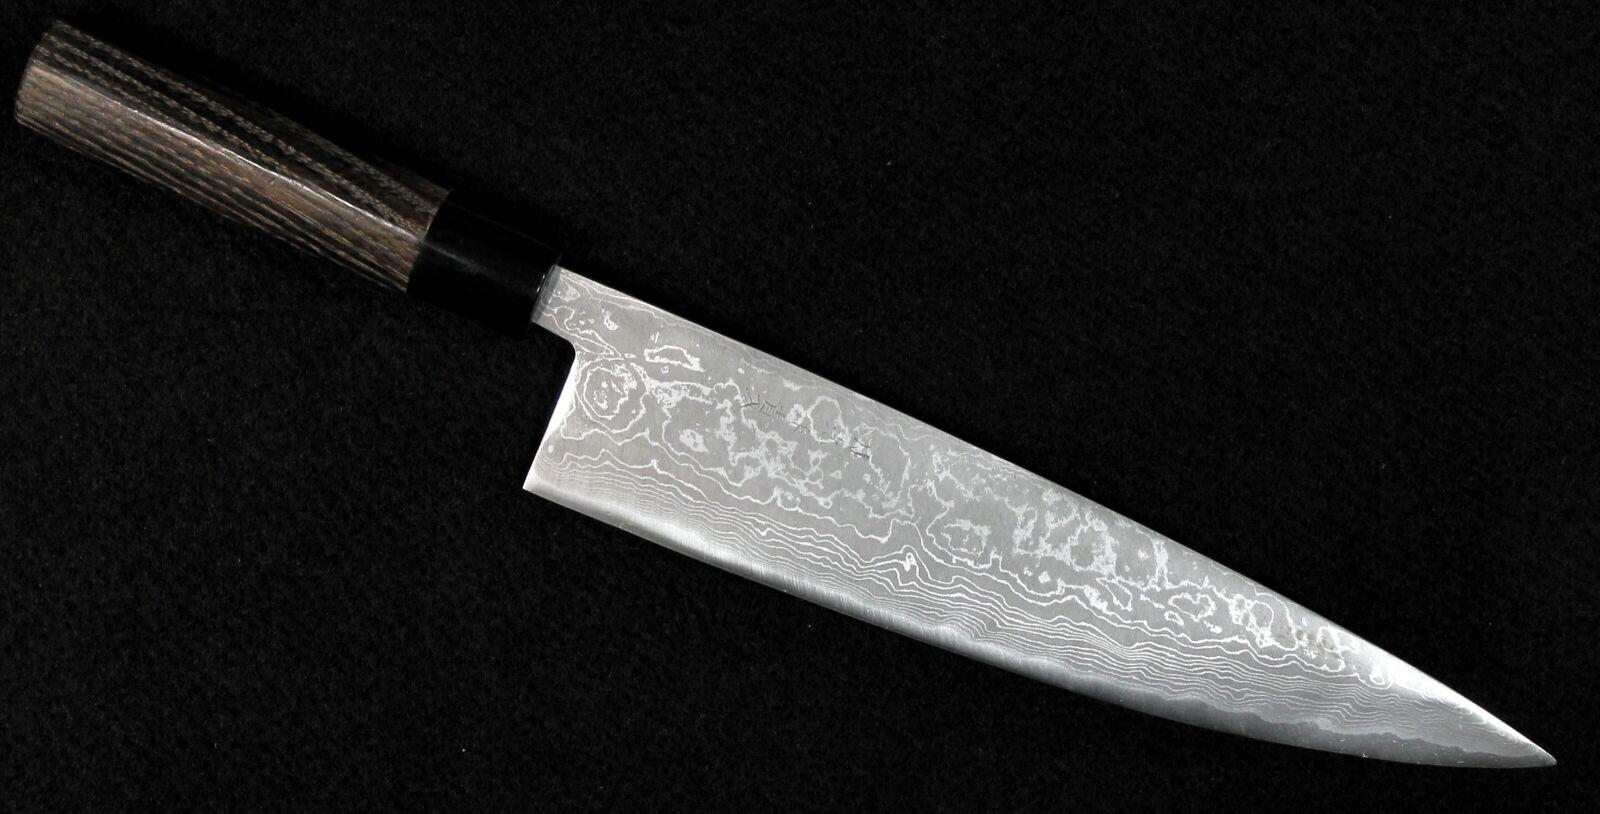 GEKKO Blau Steel Migaki Damascus Chef Knife 240mm Chestnut Handle  1426